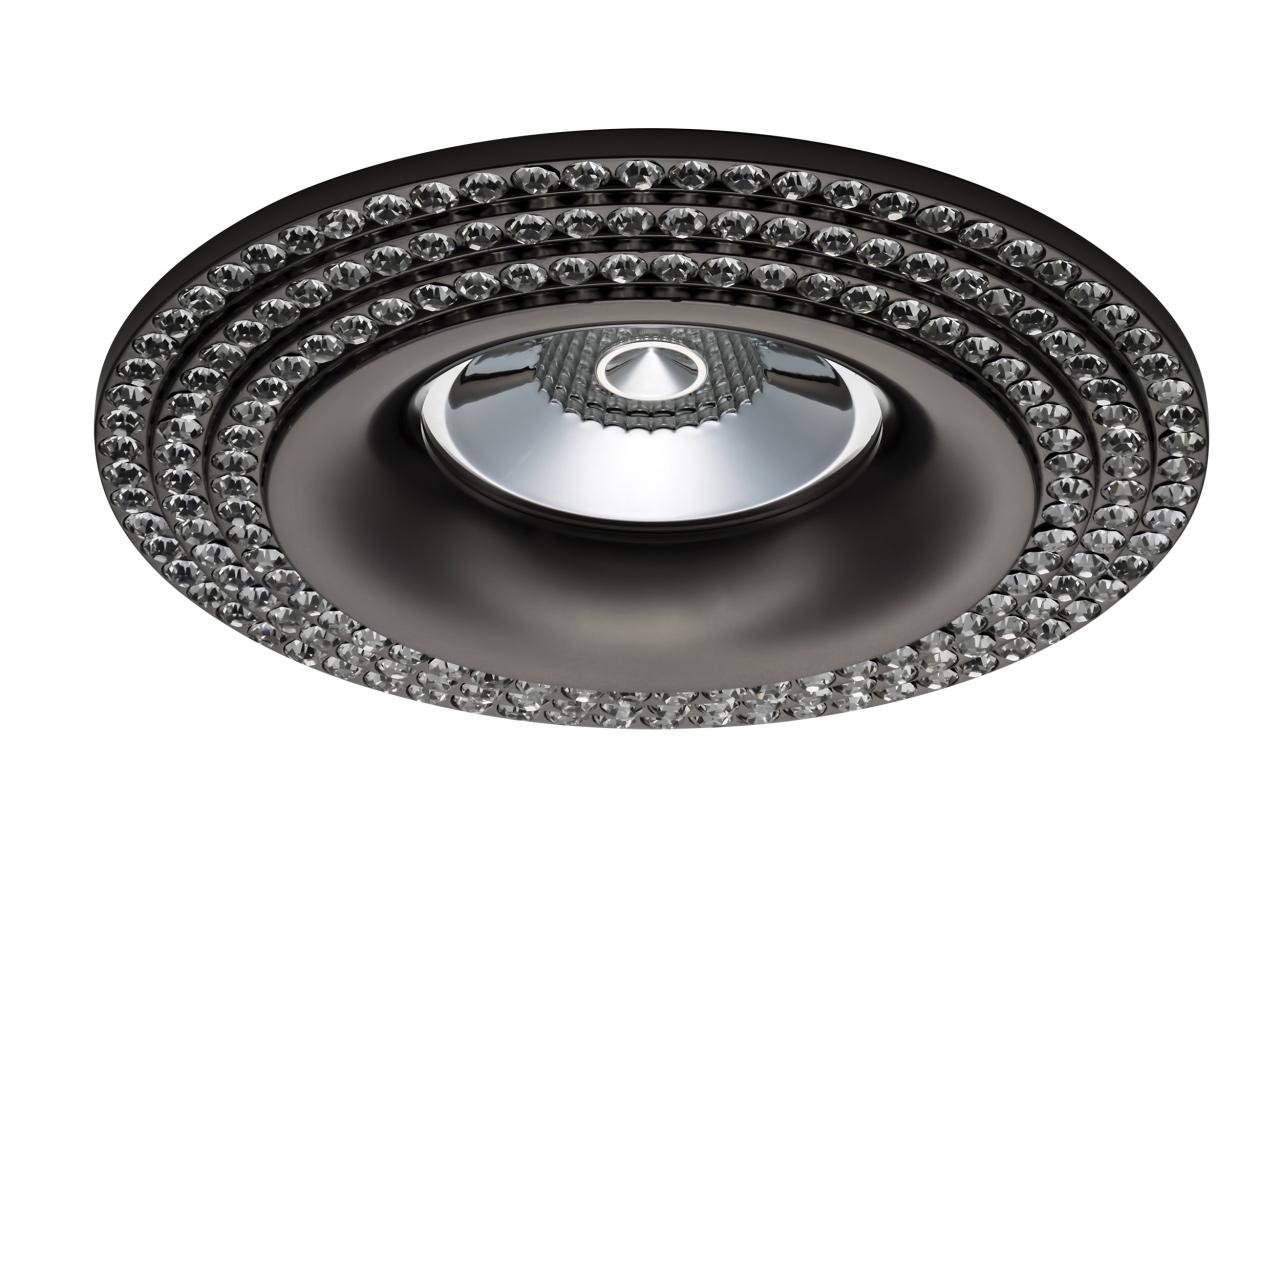 Светильник Miriade MR16 / HP16 черный хром Lightstar 011977